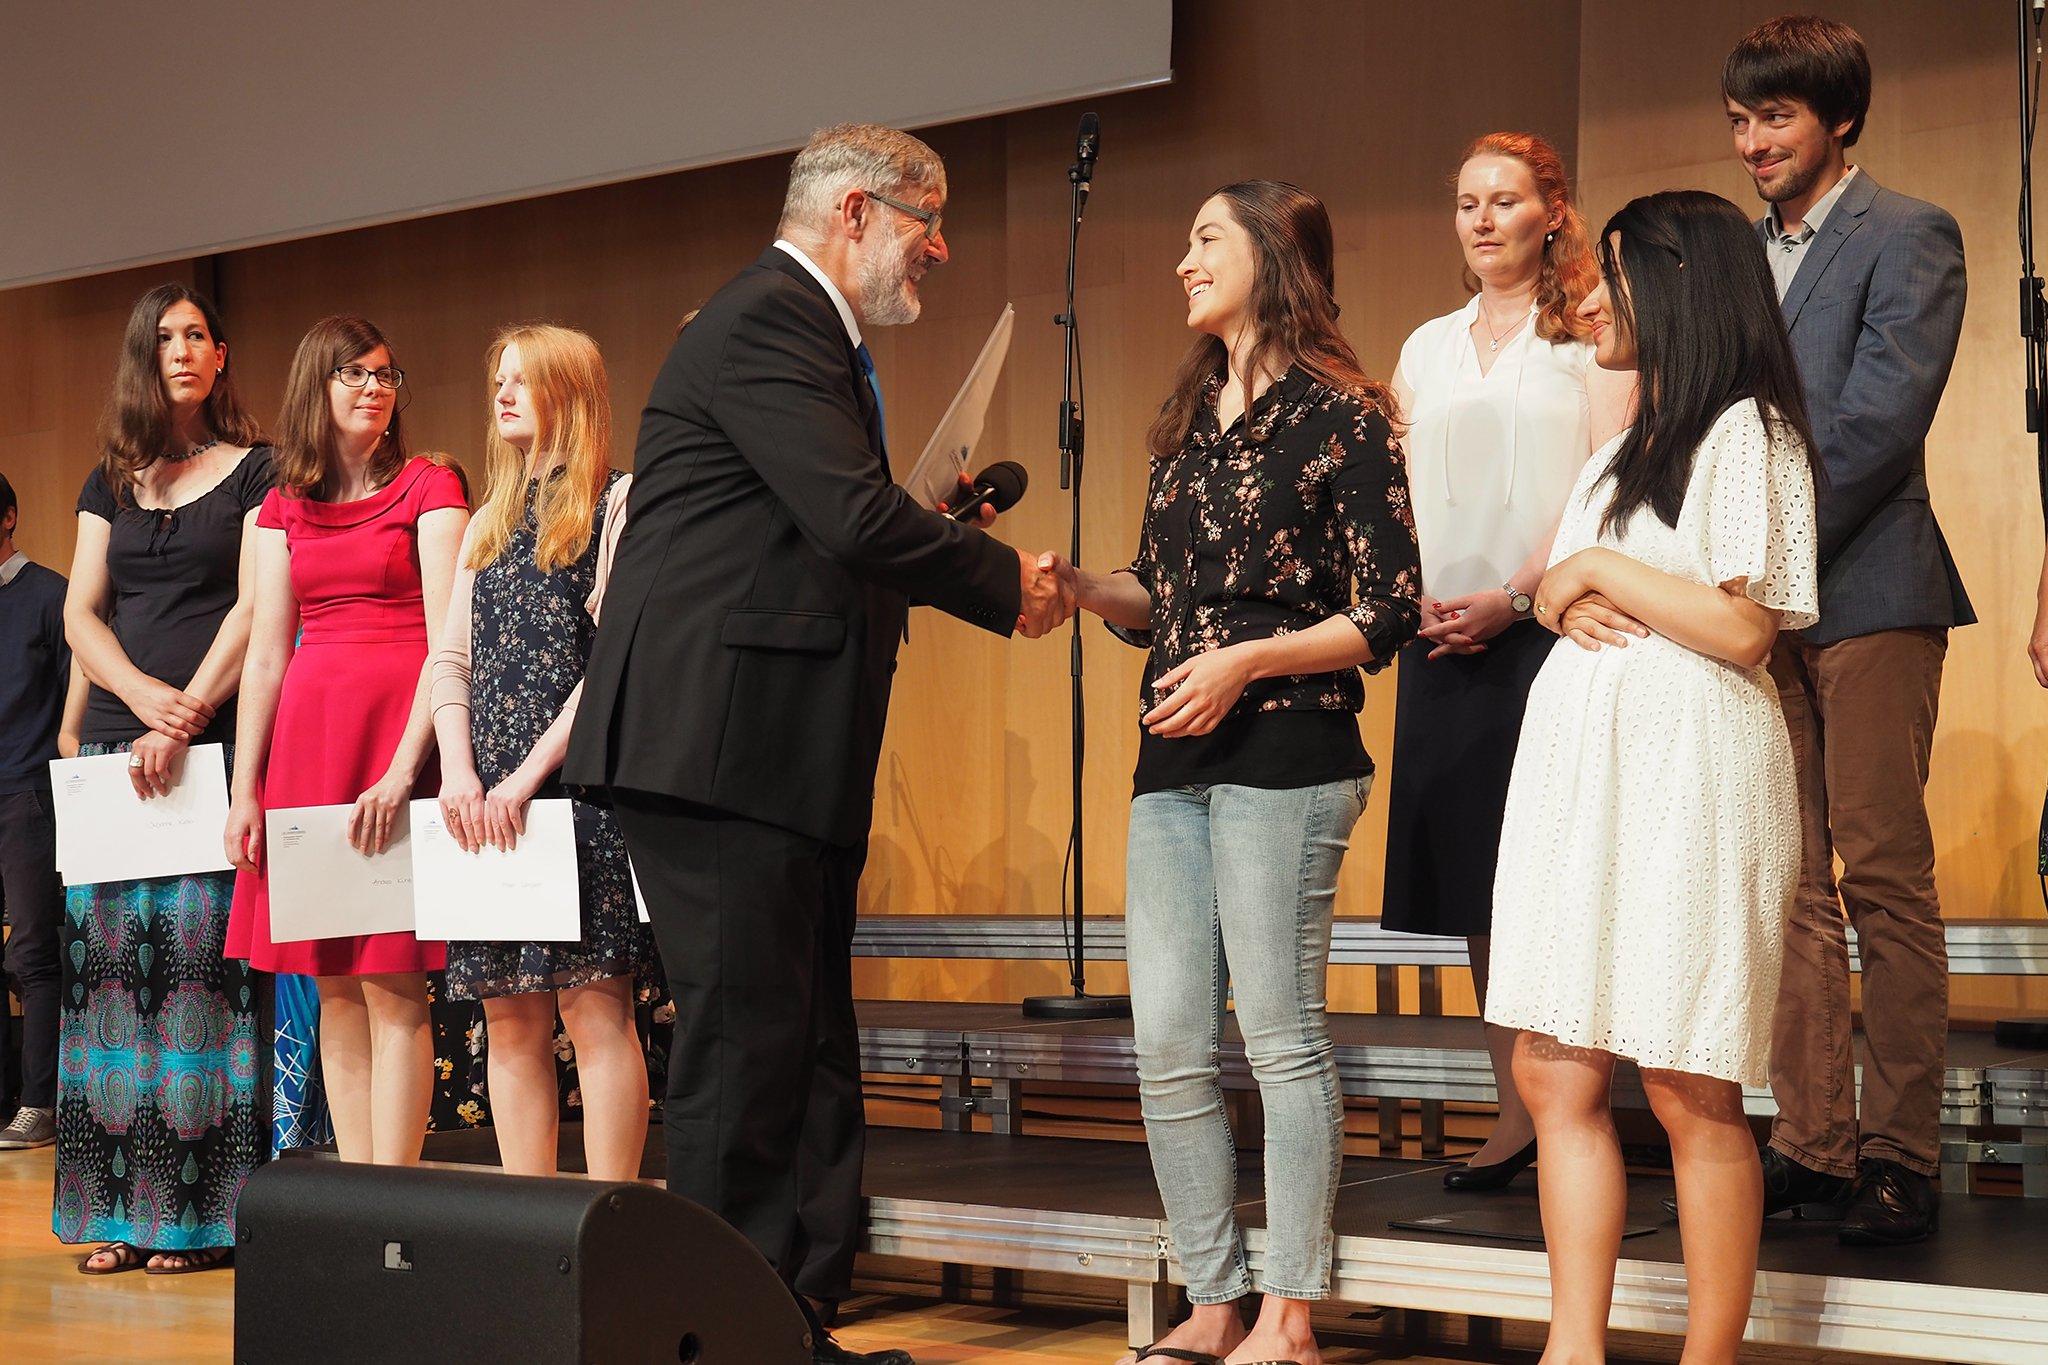 tsc-Jahresfest 2019: René Wälty, Leiter tsc-Jahreskurs, gratuliert den Jahreskurs-Absolventen.